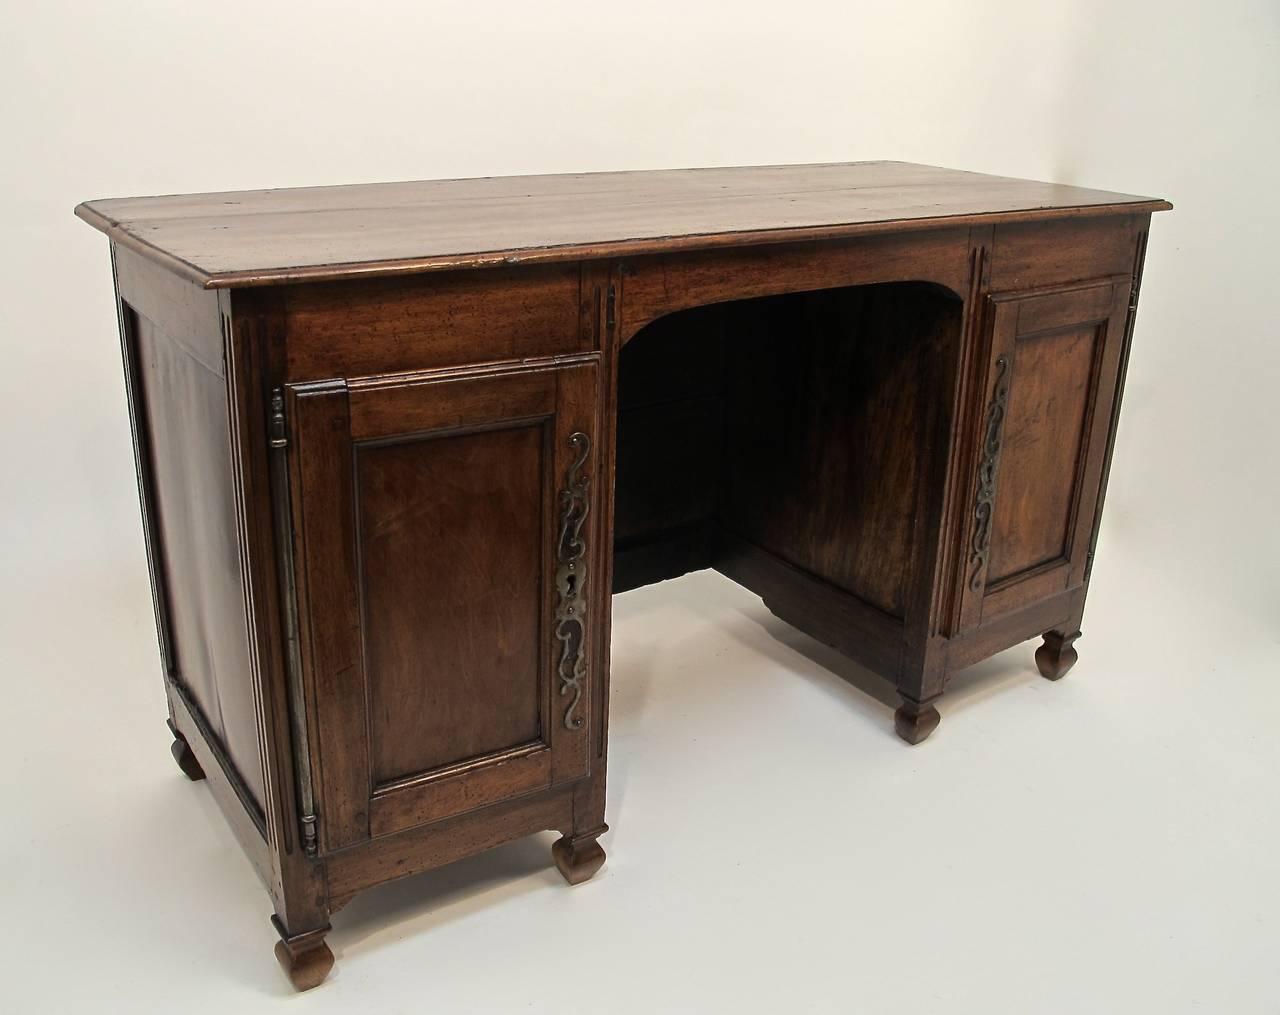 18th century french walnut desk dressing table at 1stdibs for Walnut dressing table